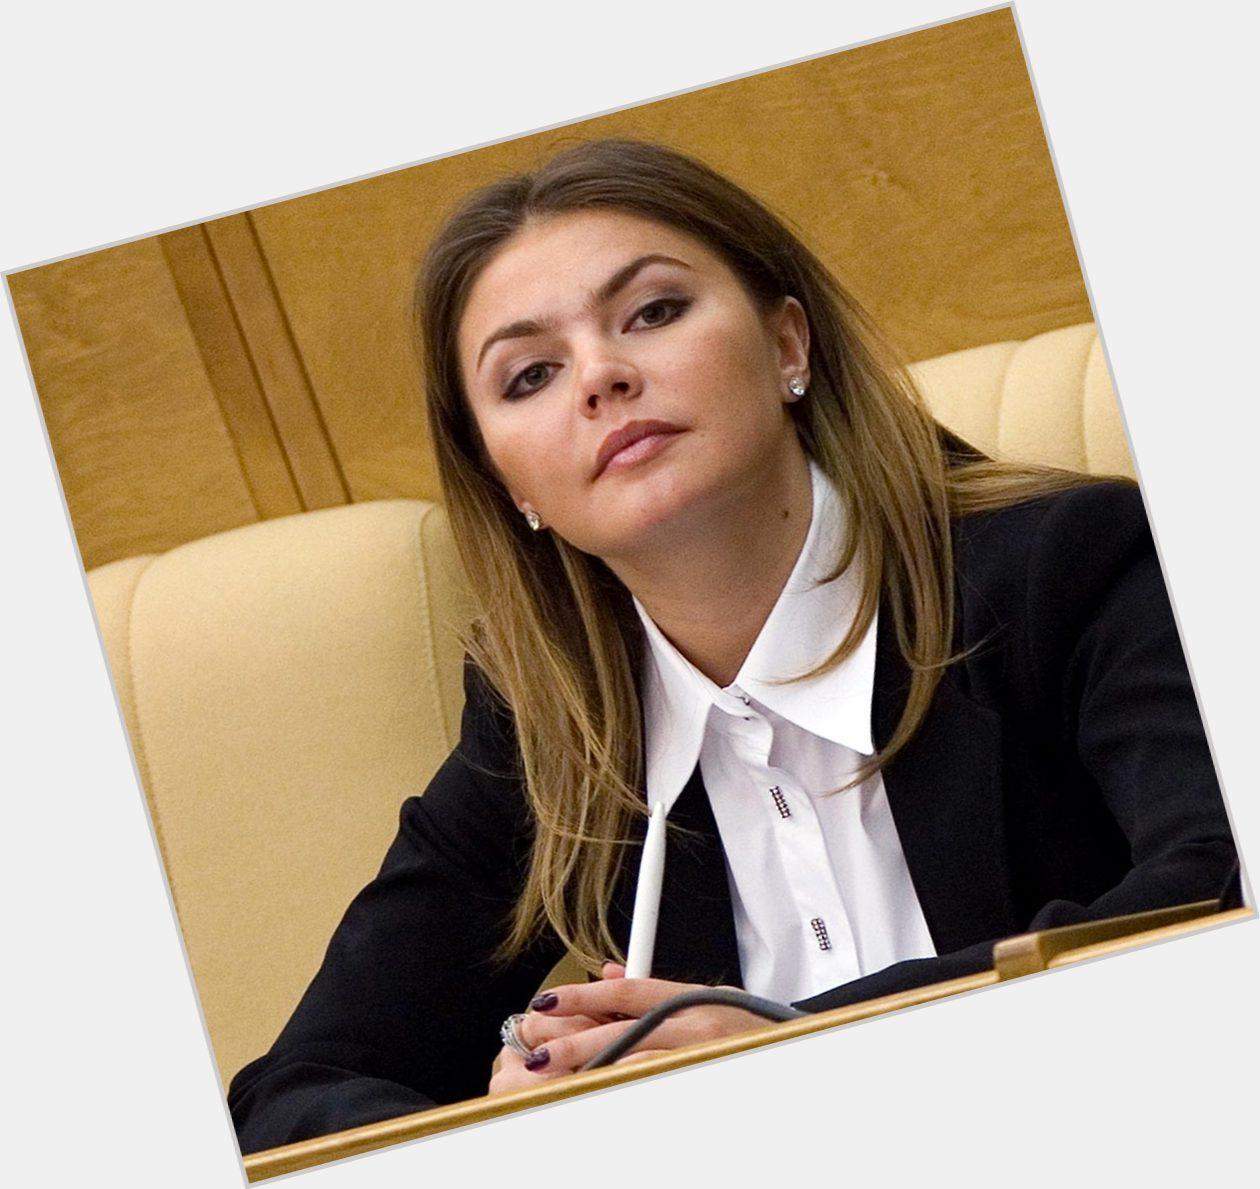 Newhairstylesformen2014 Com: Nn Models Videos Only Jailbait Sandra Orlow